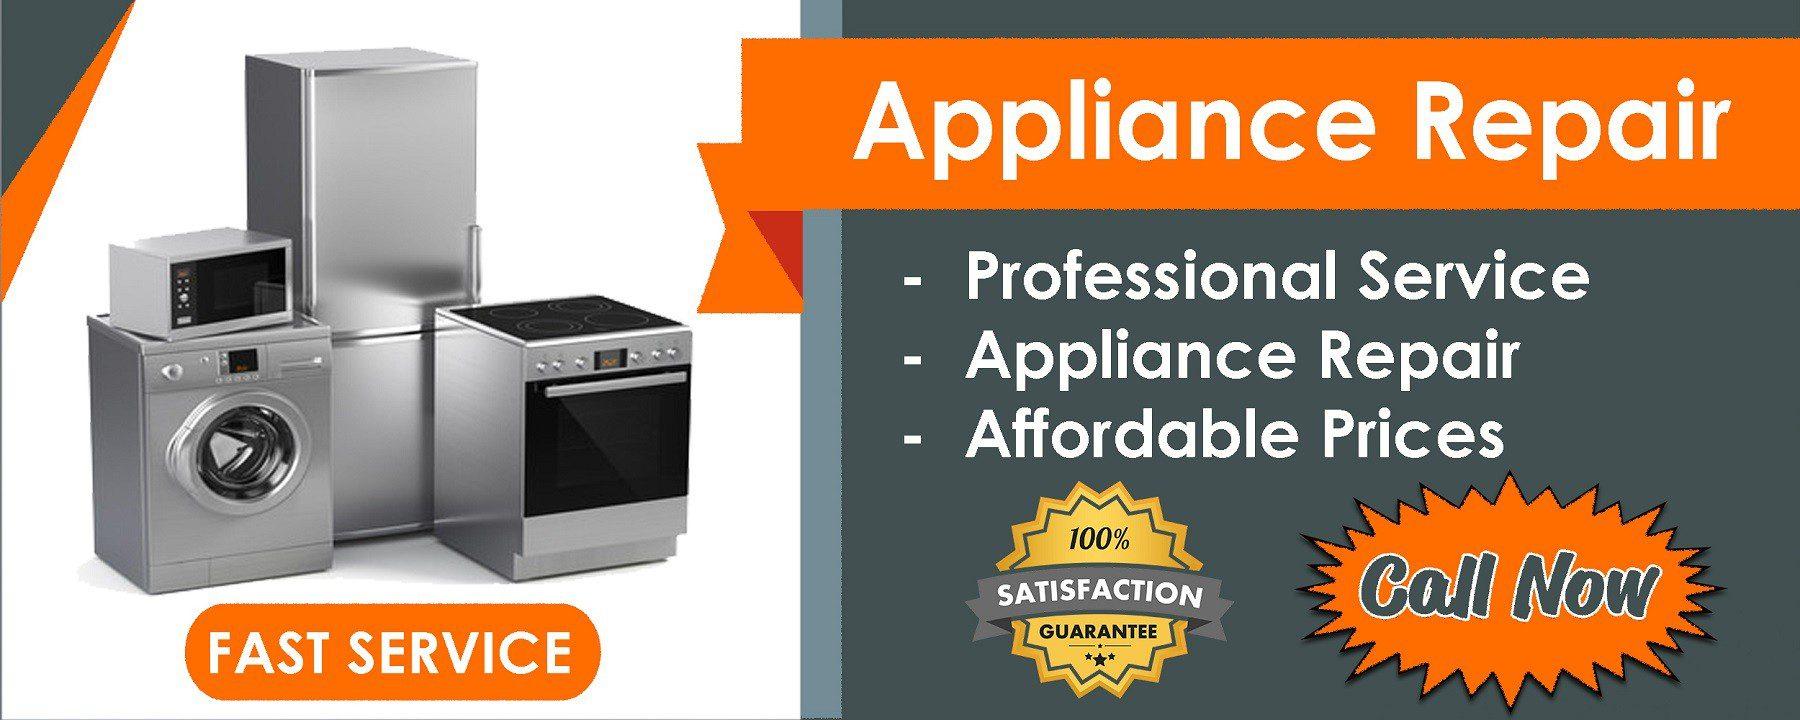 appliance-repair-service-list banner